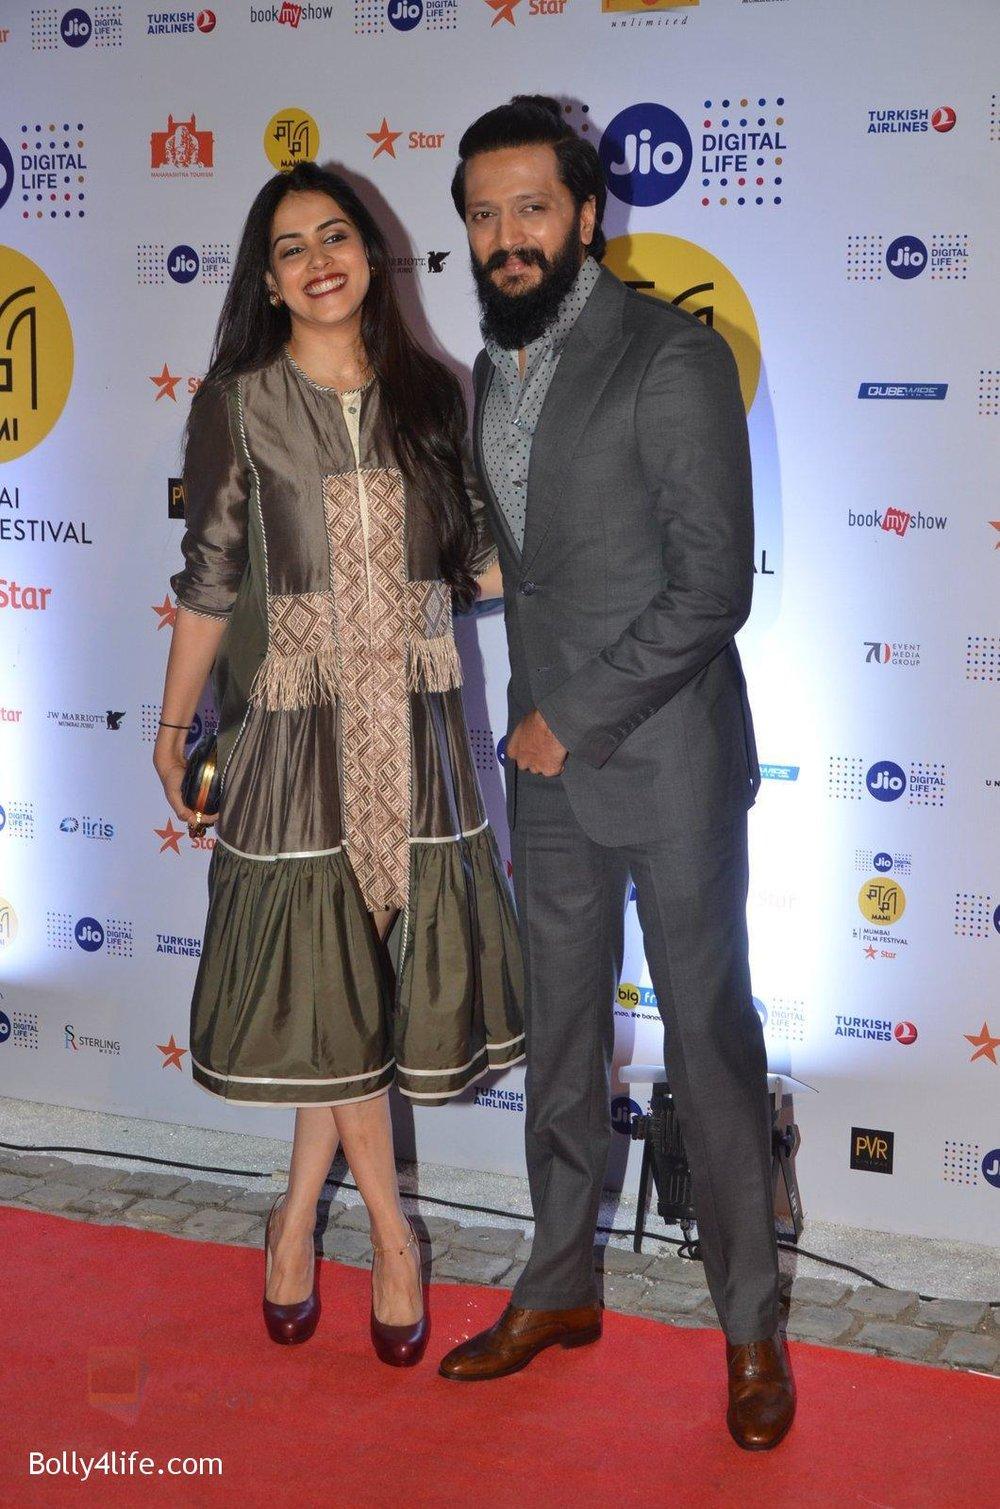 Genelia-D-Souza-Riteish-Deshmukh-at-MAMI-Film-Festival-2016-on-20th-Oct-2016-111.jpg